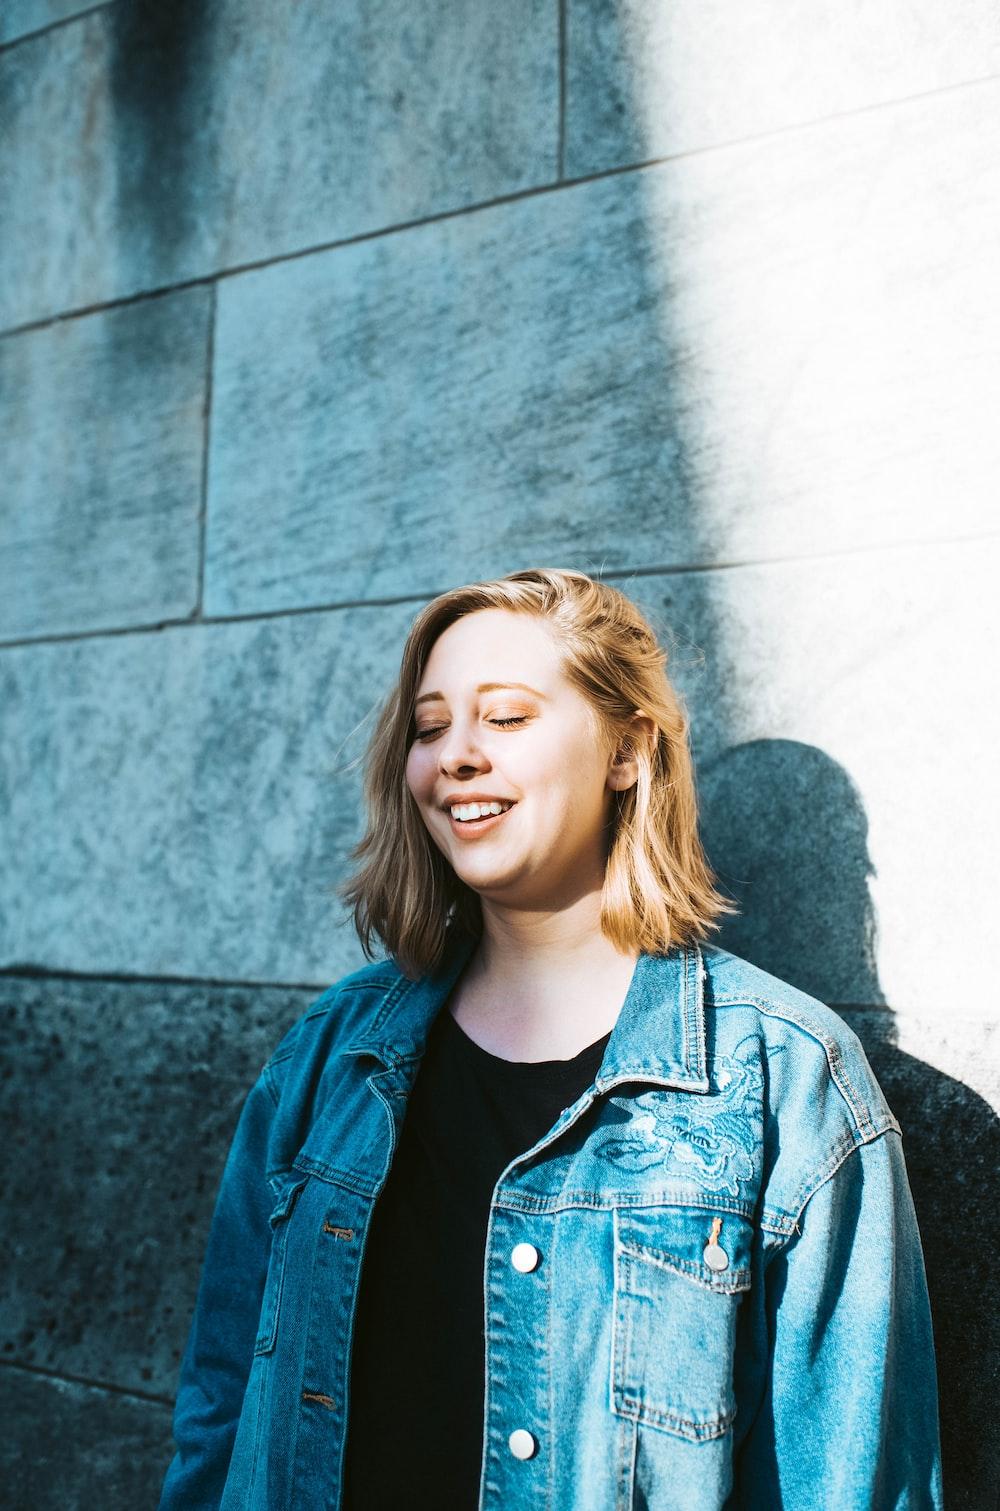 woman in blue denim jacket leaning on wall